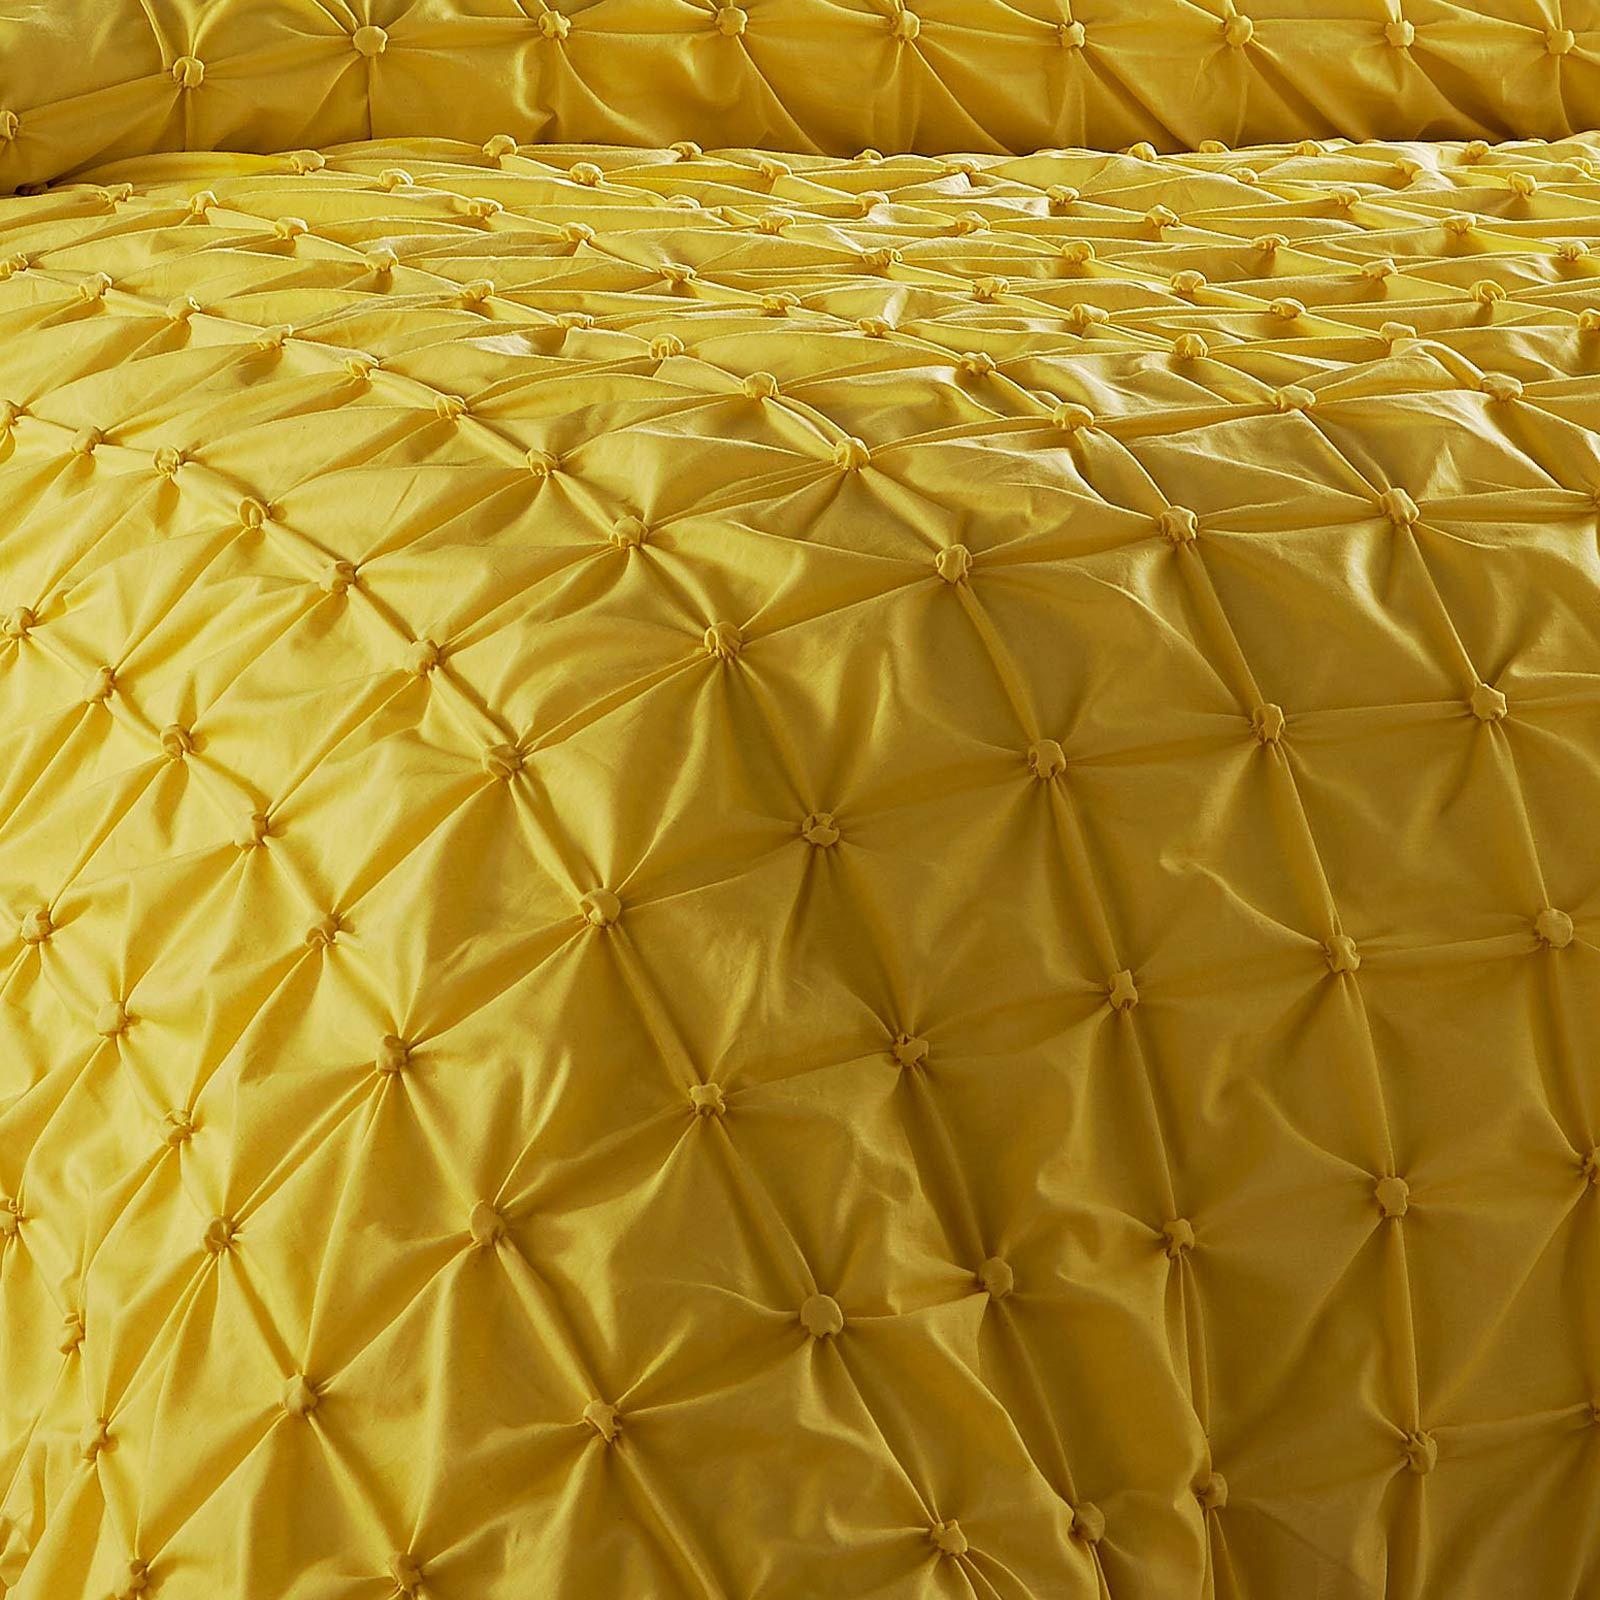 Pleated-Duvet-Covers-Seville-Pintuck-Luxury-Cotton-Rich-Quilt-Bedding-Sets thumbnail 7